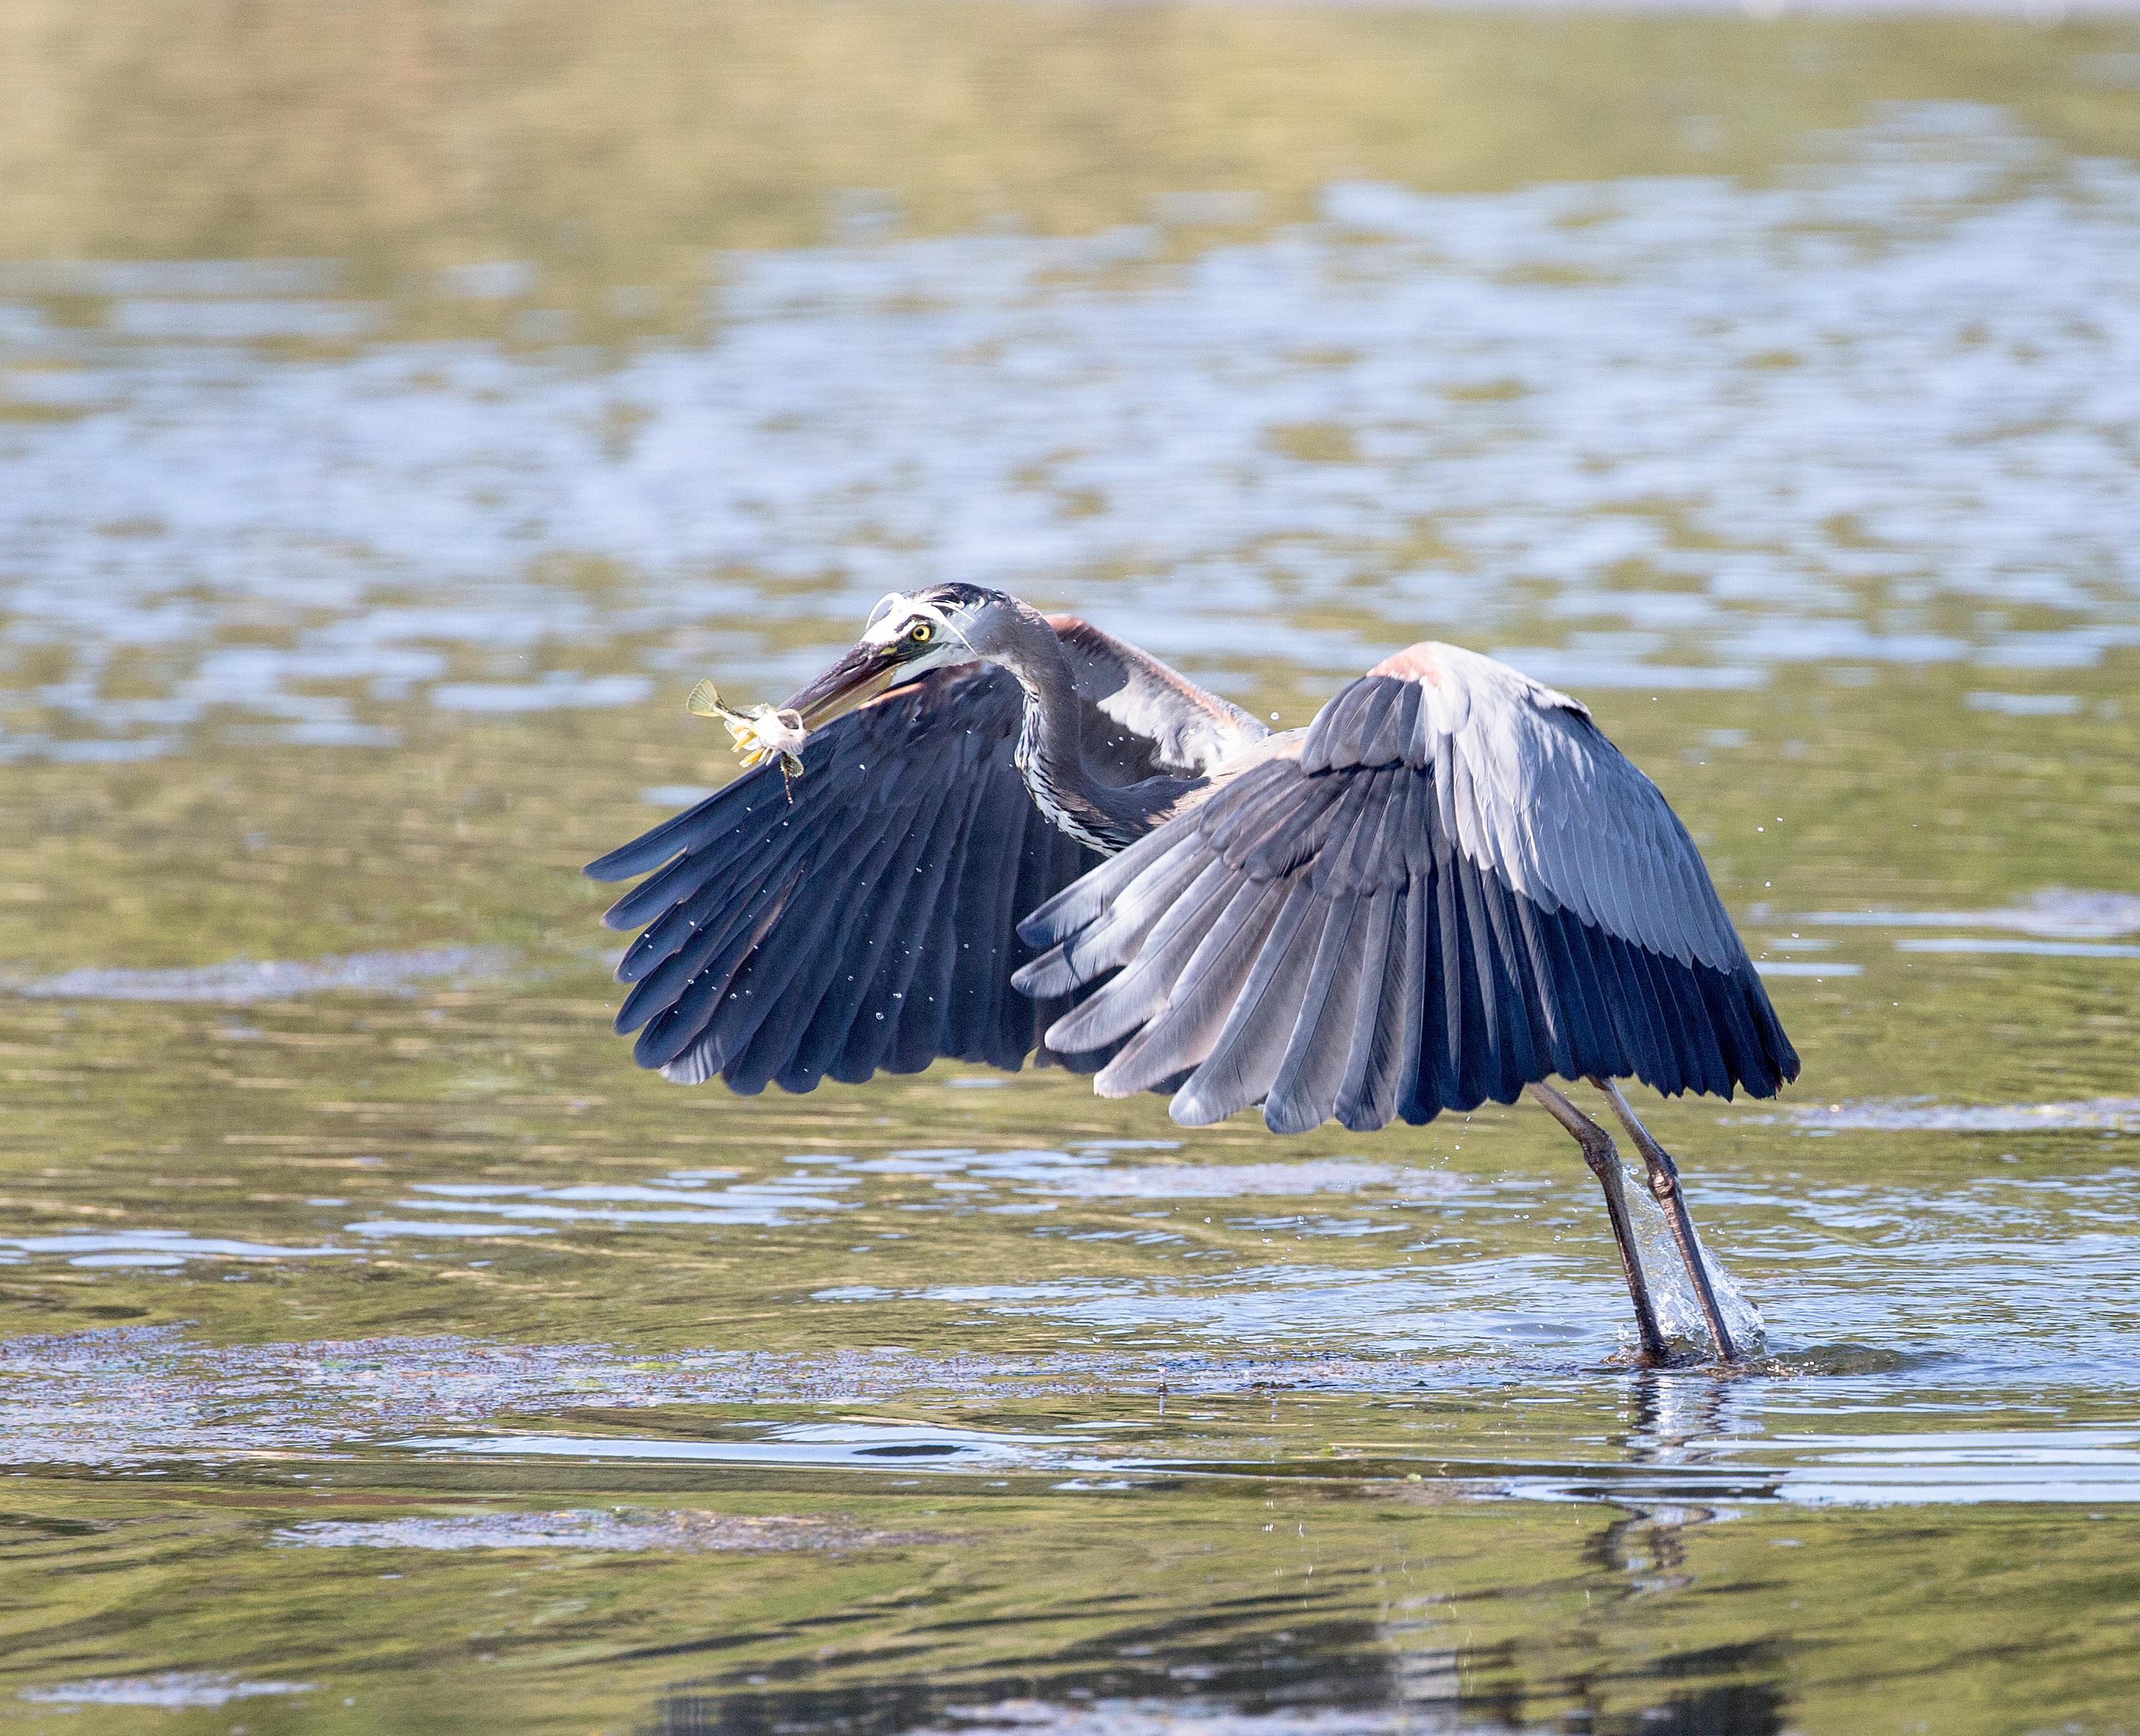 BI-Heron Flying with Fish 6519